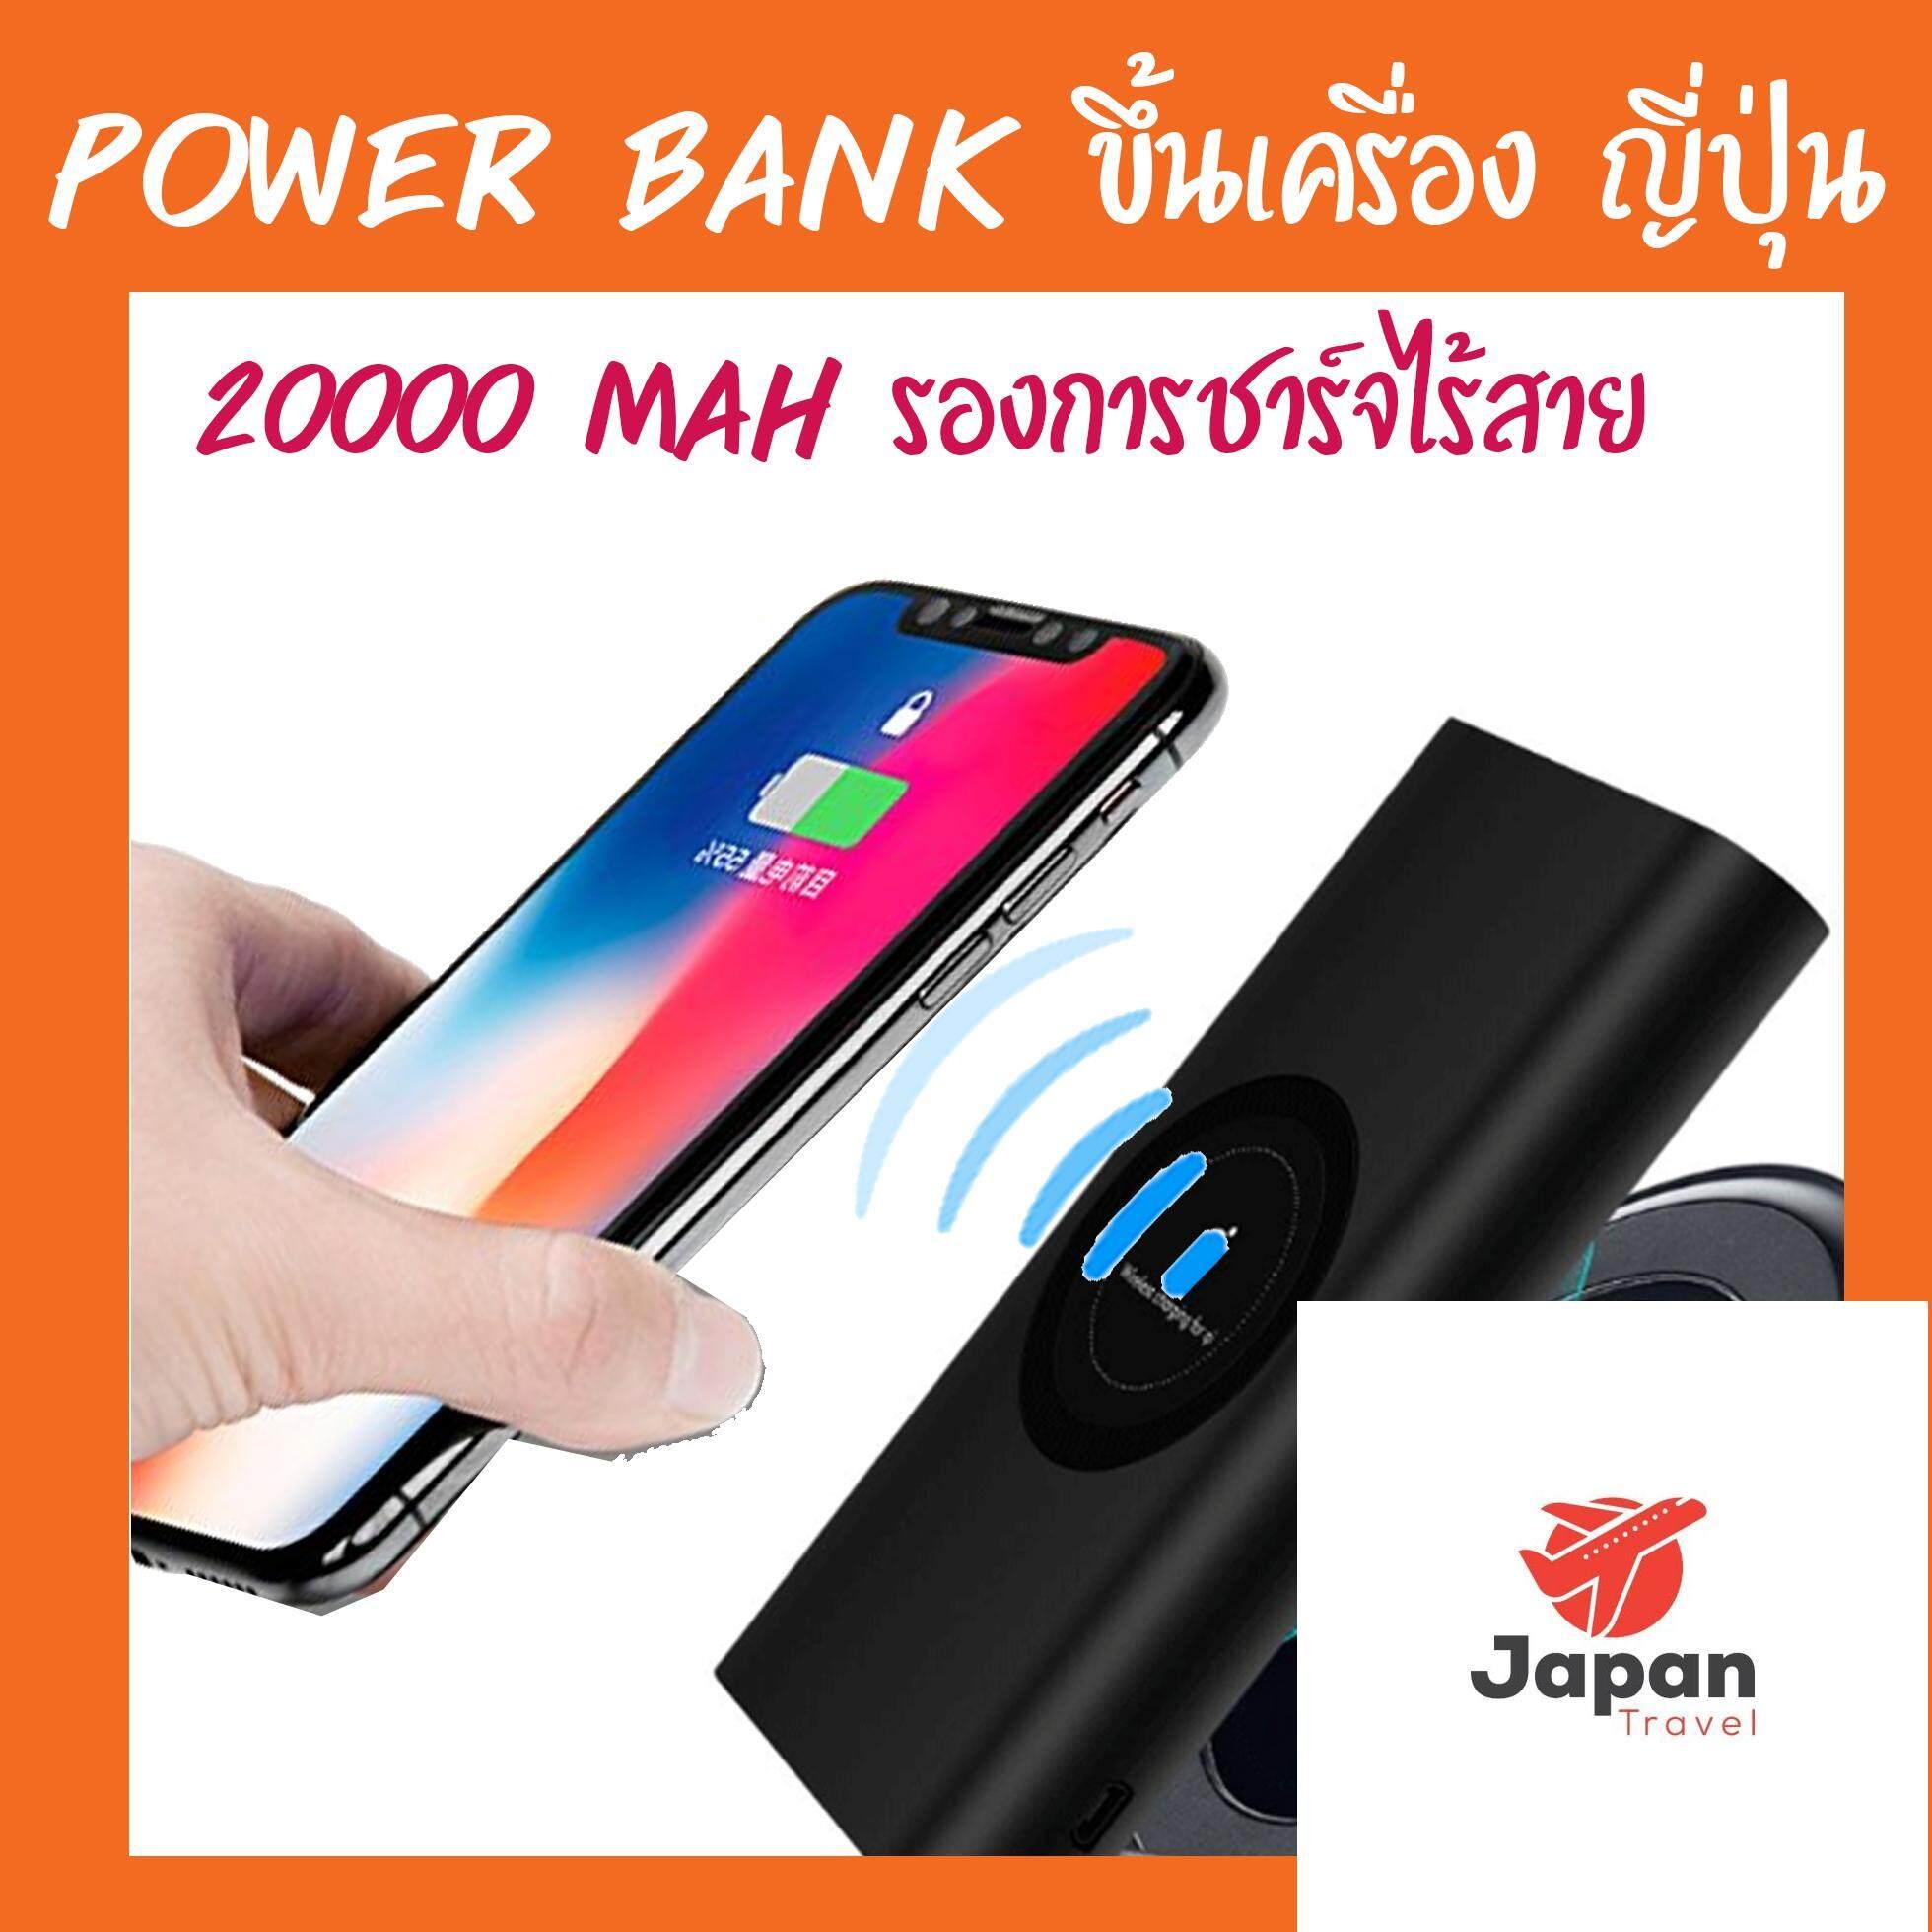 Power Bank สำหรับ Iโฟน Xs โดยเฉพาะ ชาร์จไร้สาย Power Bank ไร้สาย ยี่ห้อไหนดี  Power Bank Wireless Fast Charger ราคา  Power Bank Wireless ยี่ห้อไหนดี  Wireless Power Bank ใช้ยังไง  แท่นชาร์จไร้สาย  Idmix Power Mix 10000mah  ที่ชาร์จไร้สาย ไอphone.